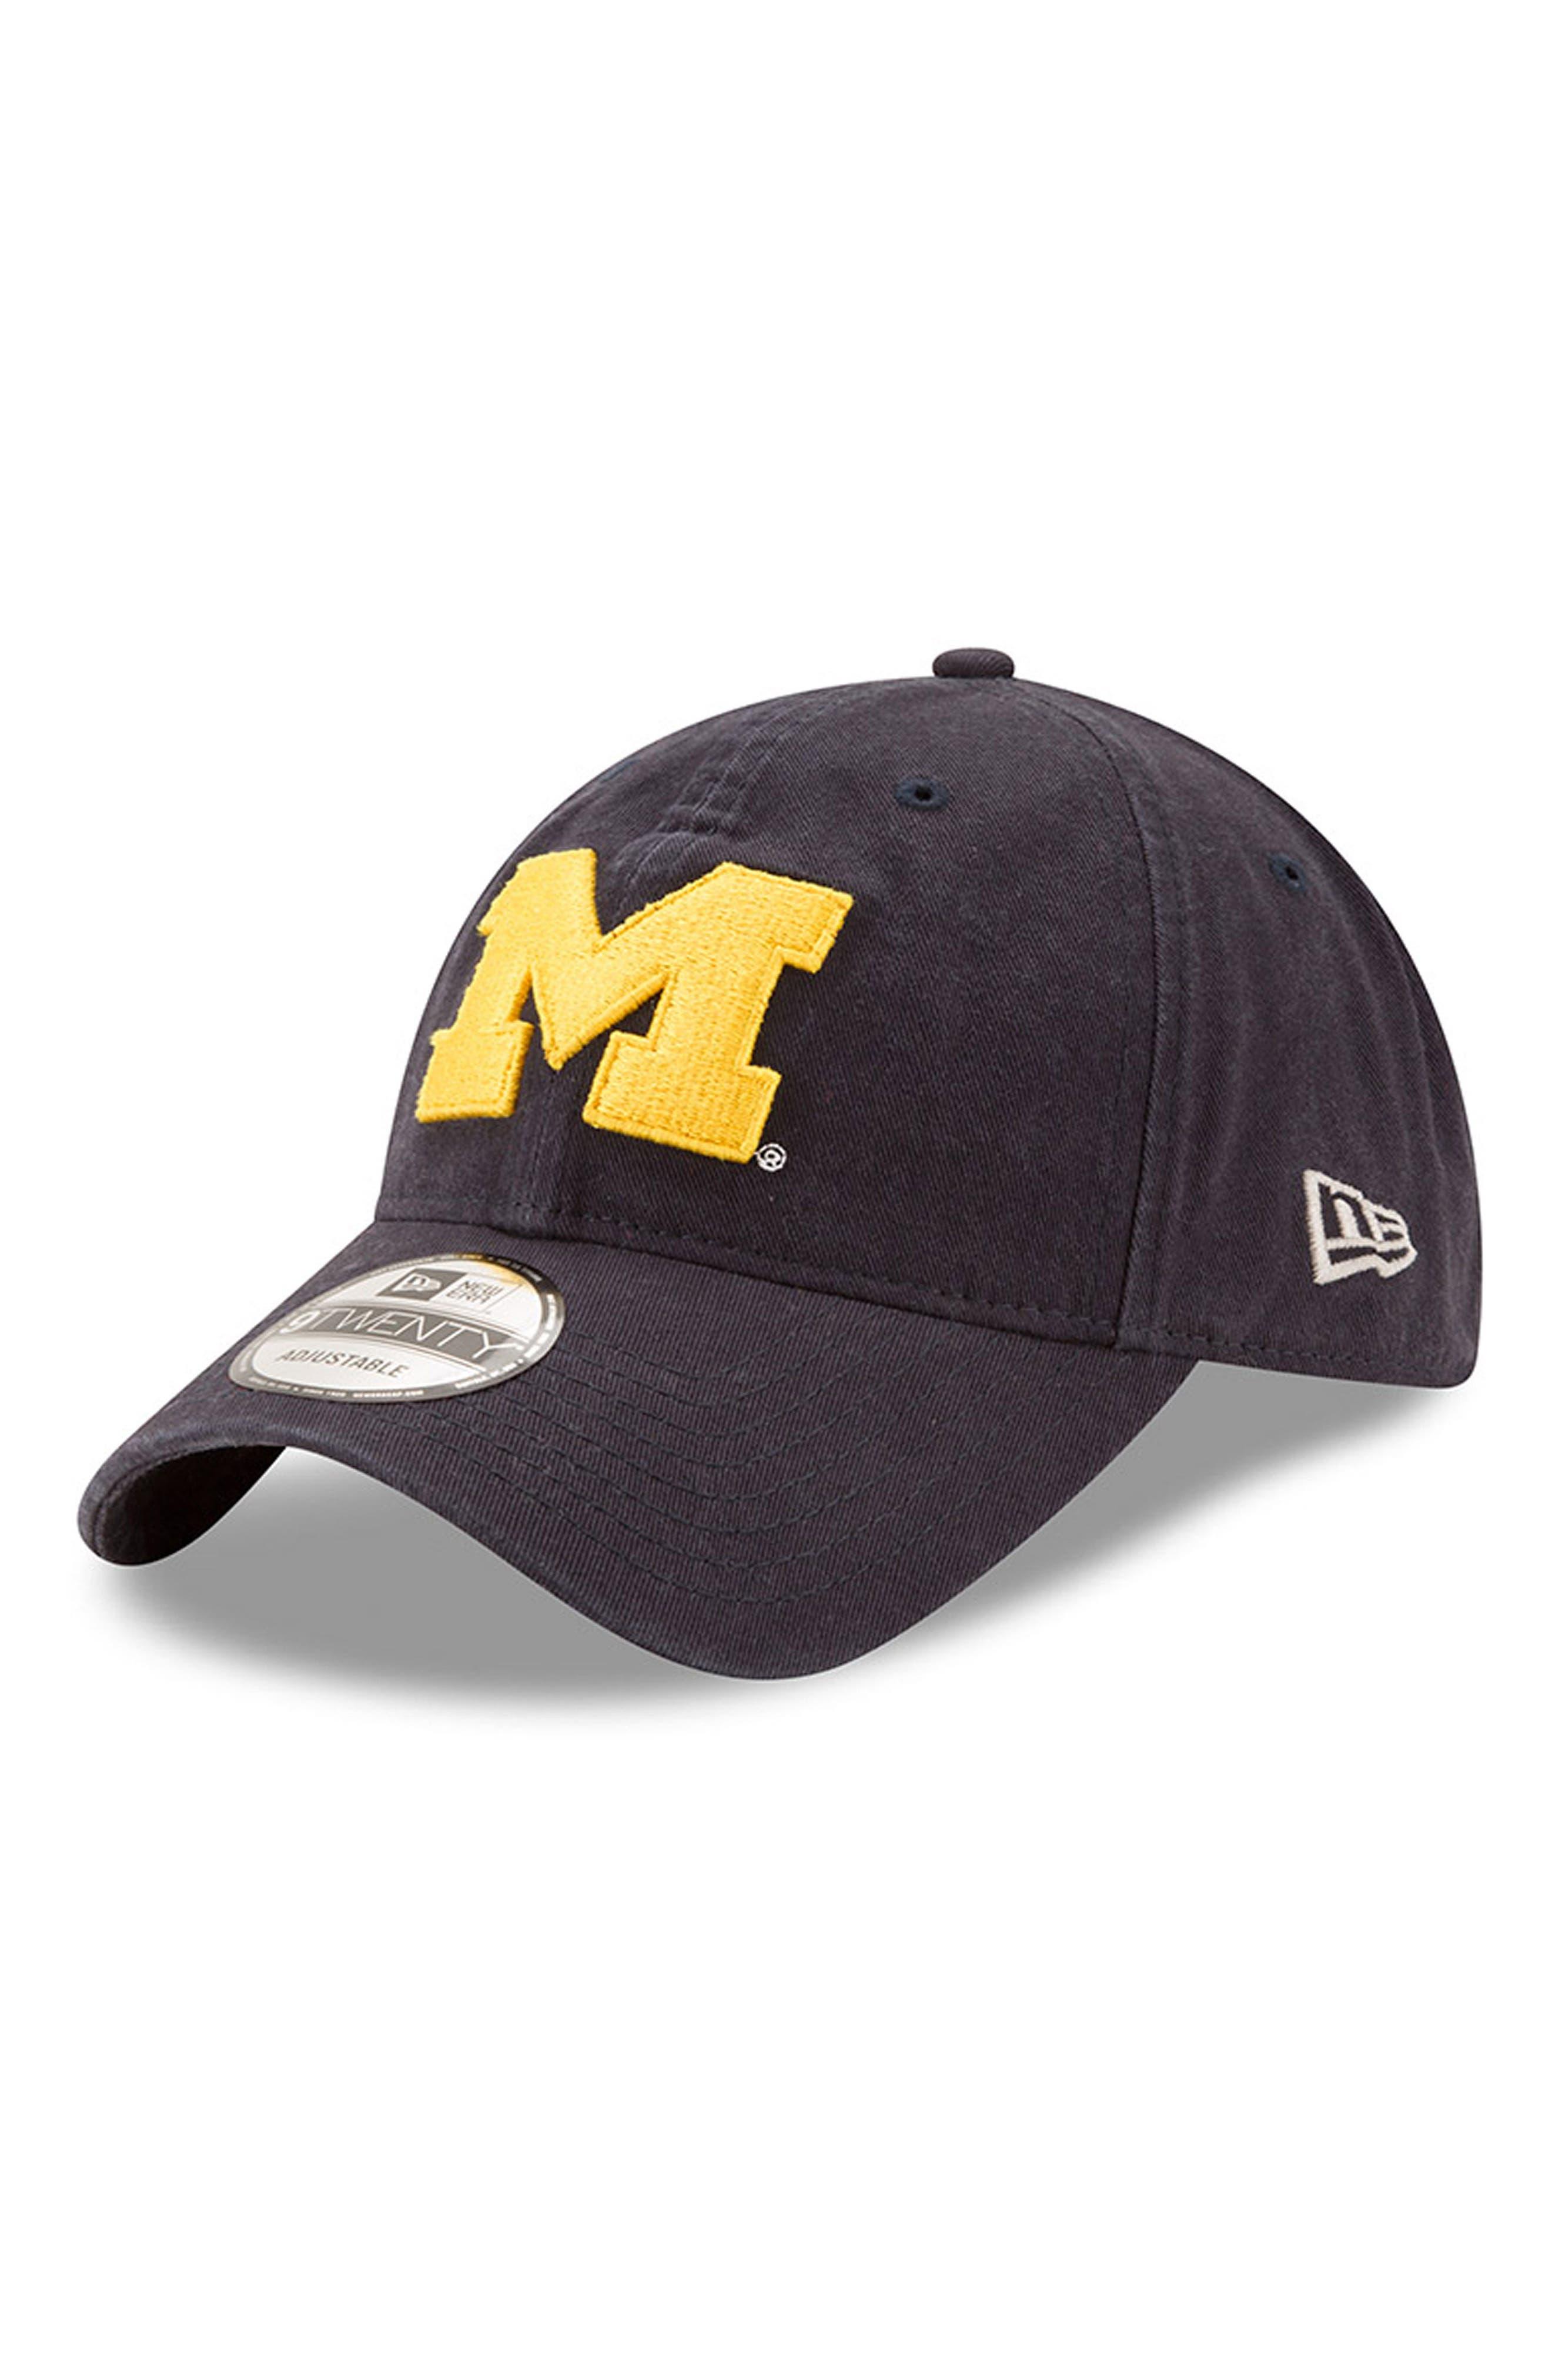 New Era Collegiate Core Classic - Michigan Wolverines Baseball Cap,                             Main thumbnail 1, color,                             Michigan Wolverines